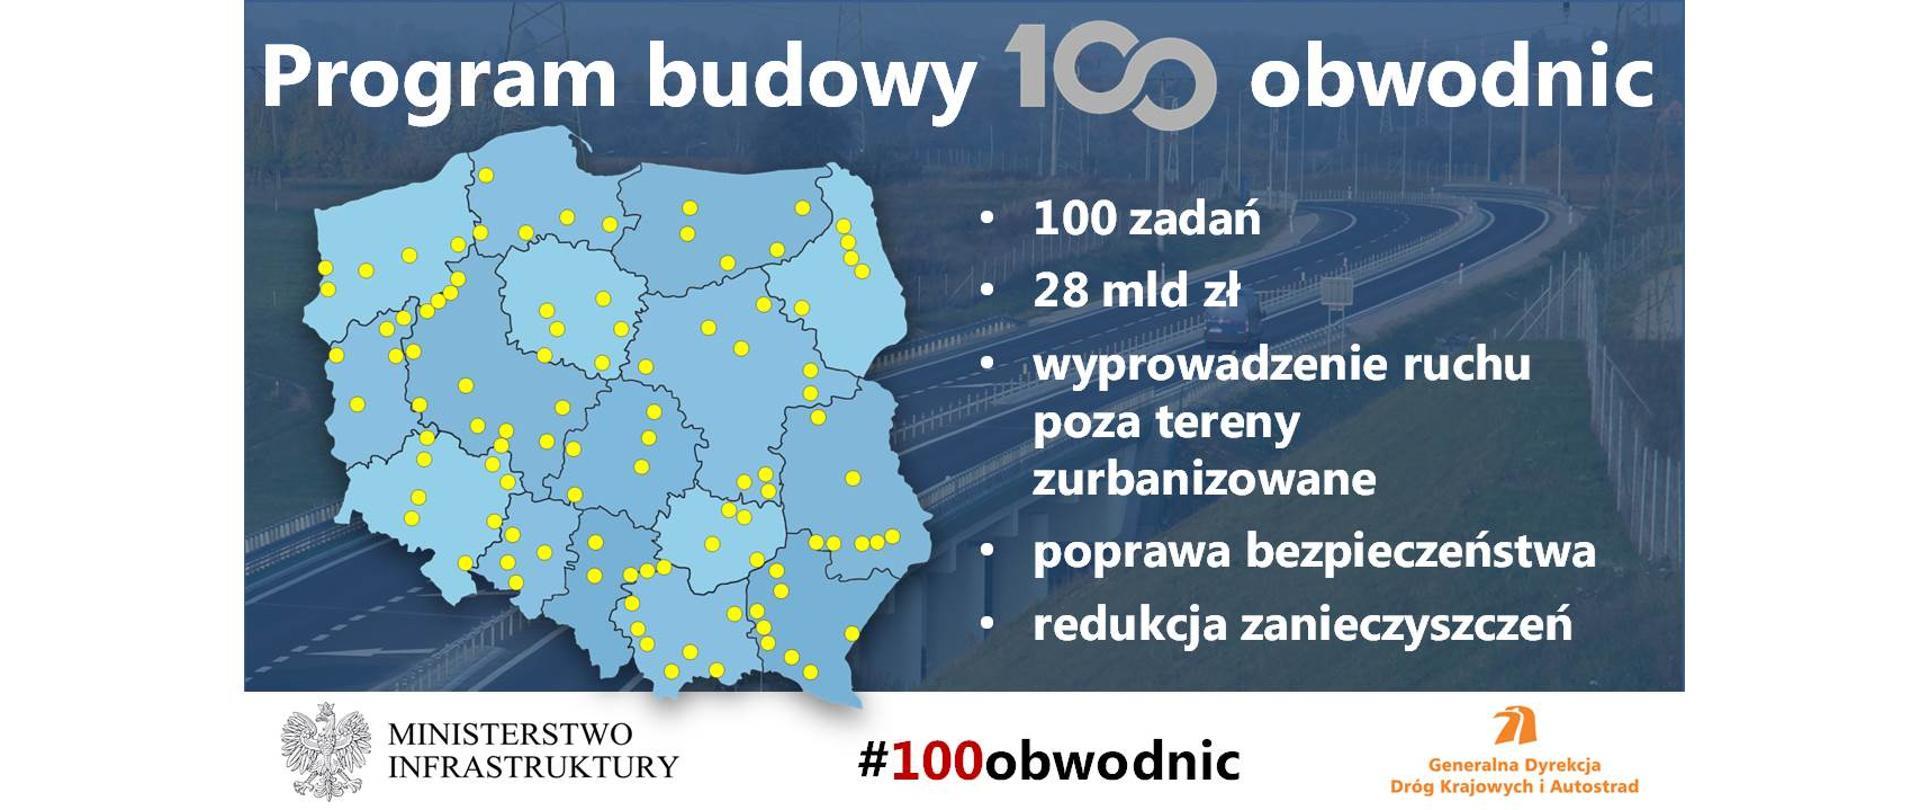 Program budowy 100 obwodnic - infografika